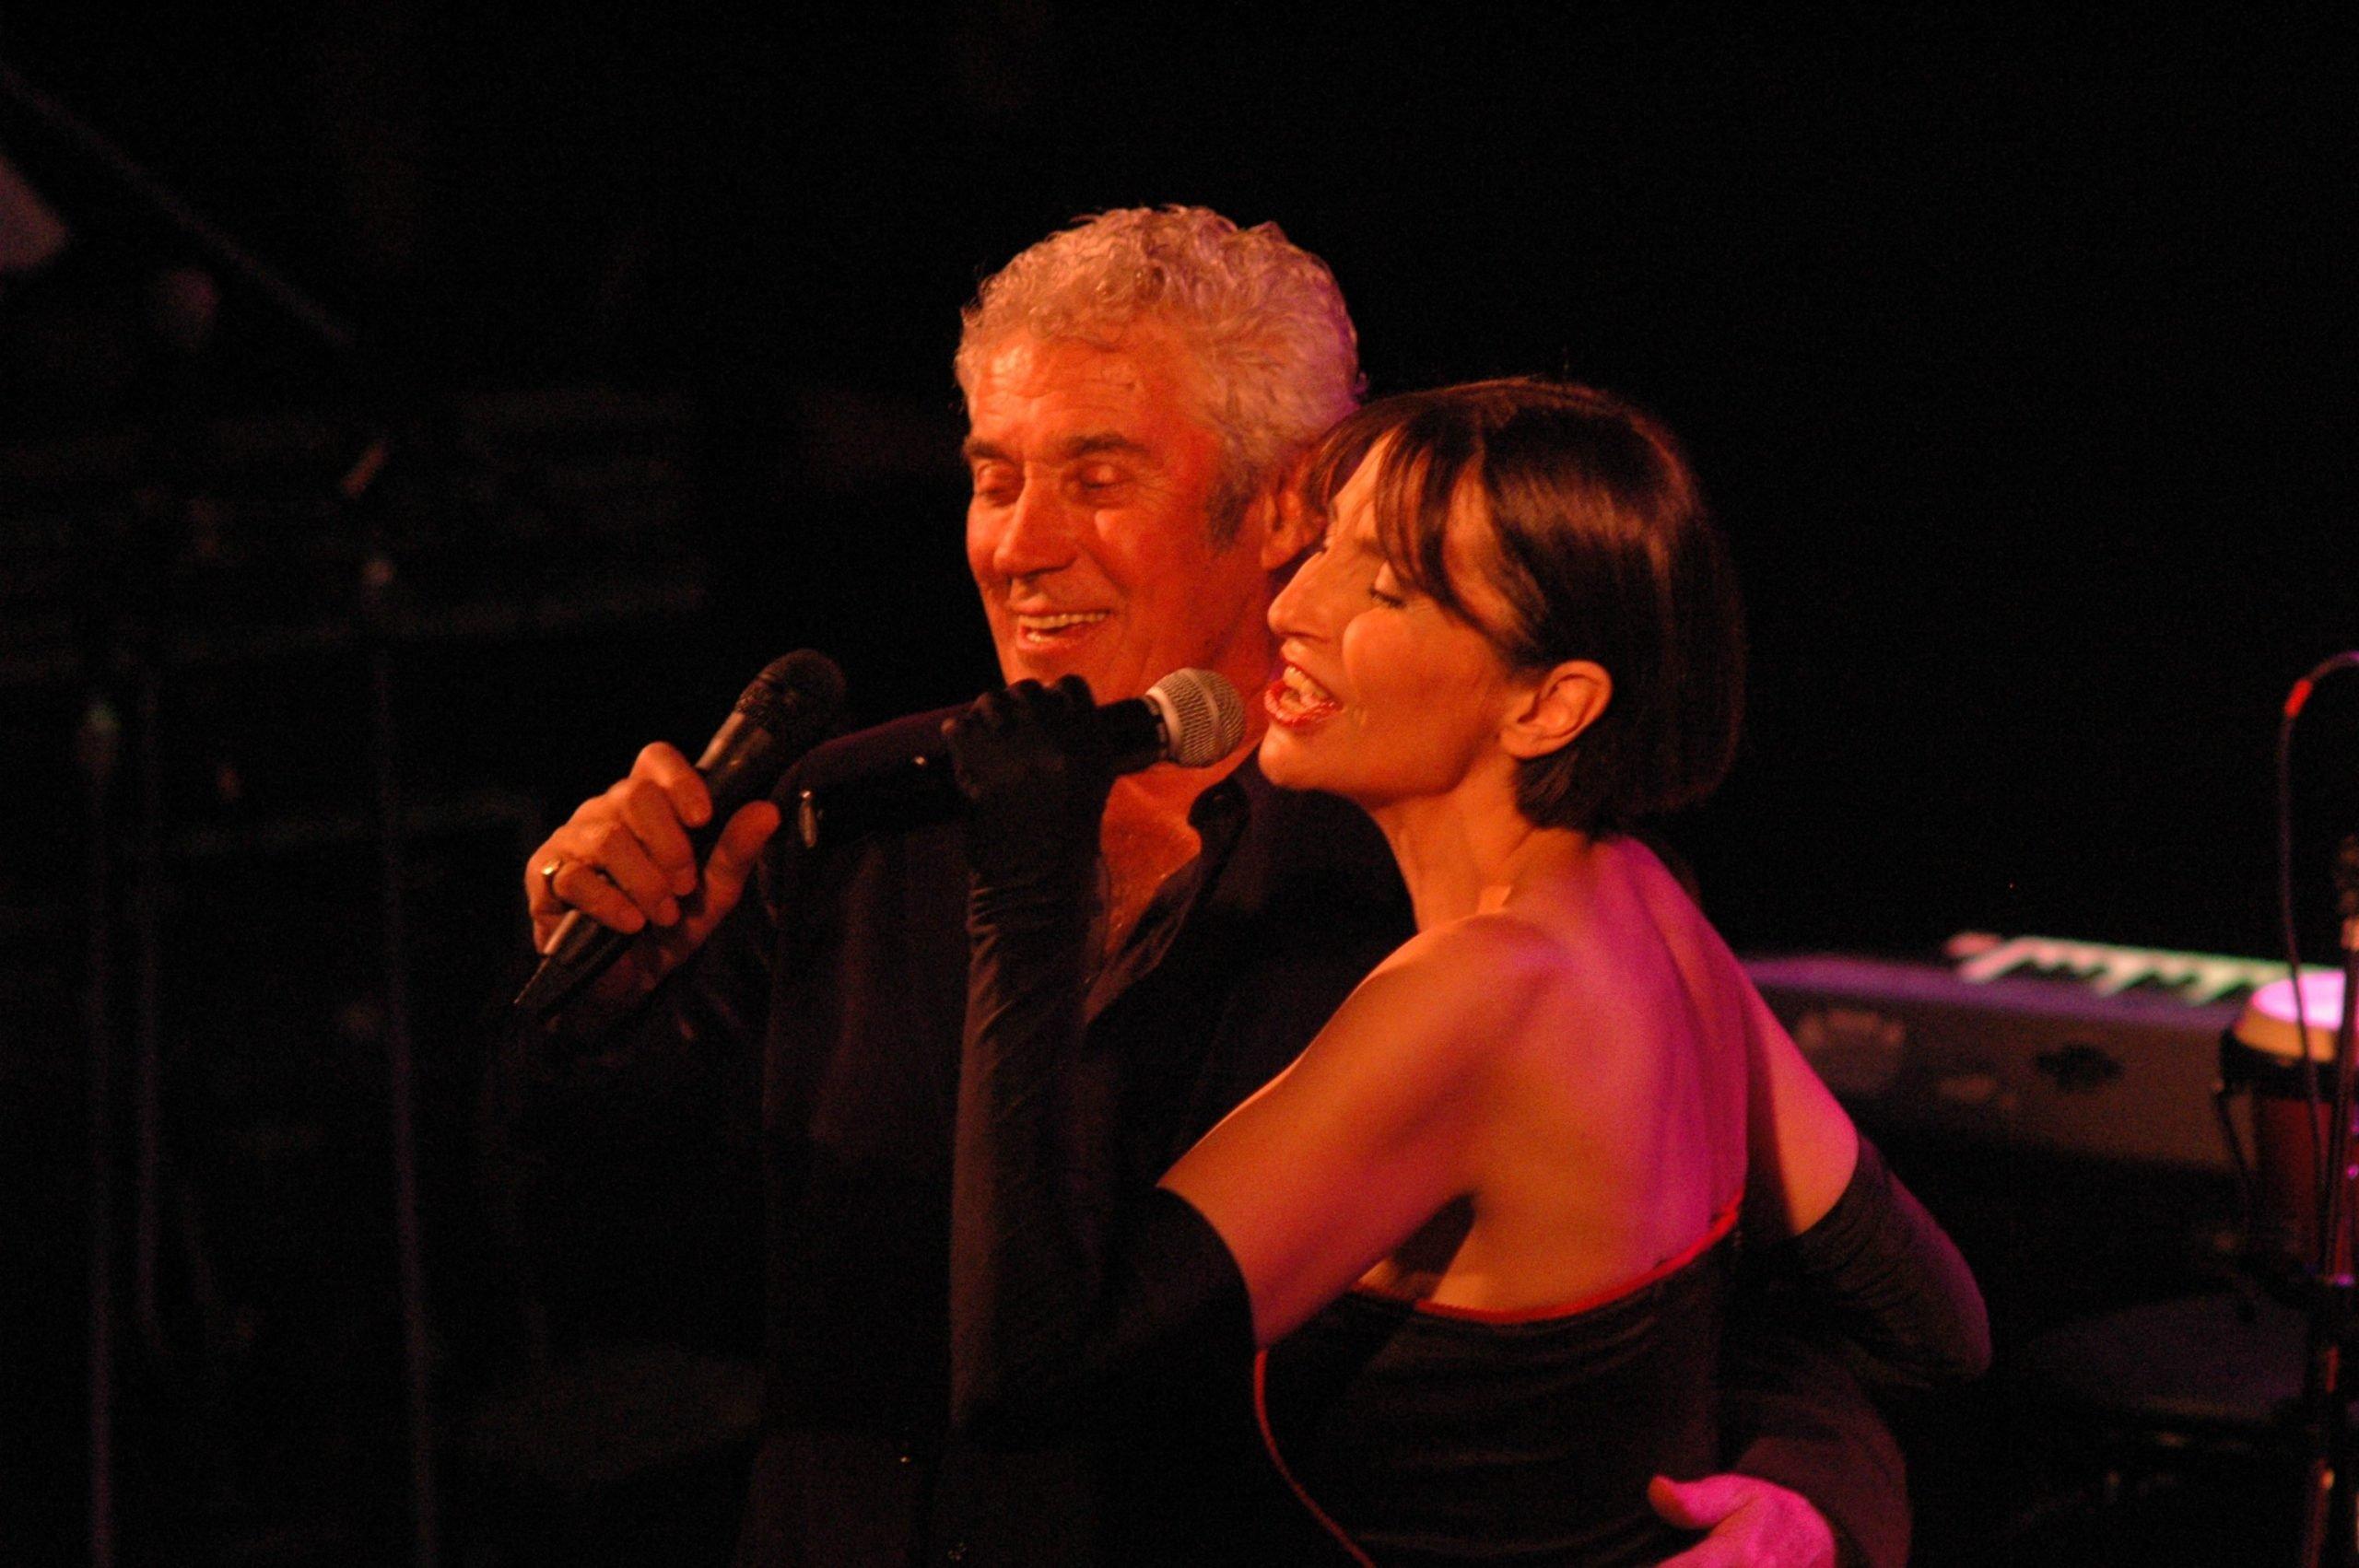 Maria Volonte and Chico Novarro